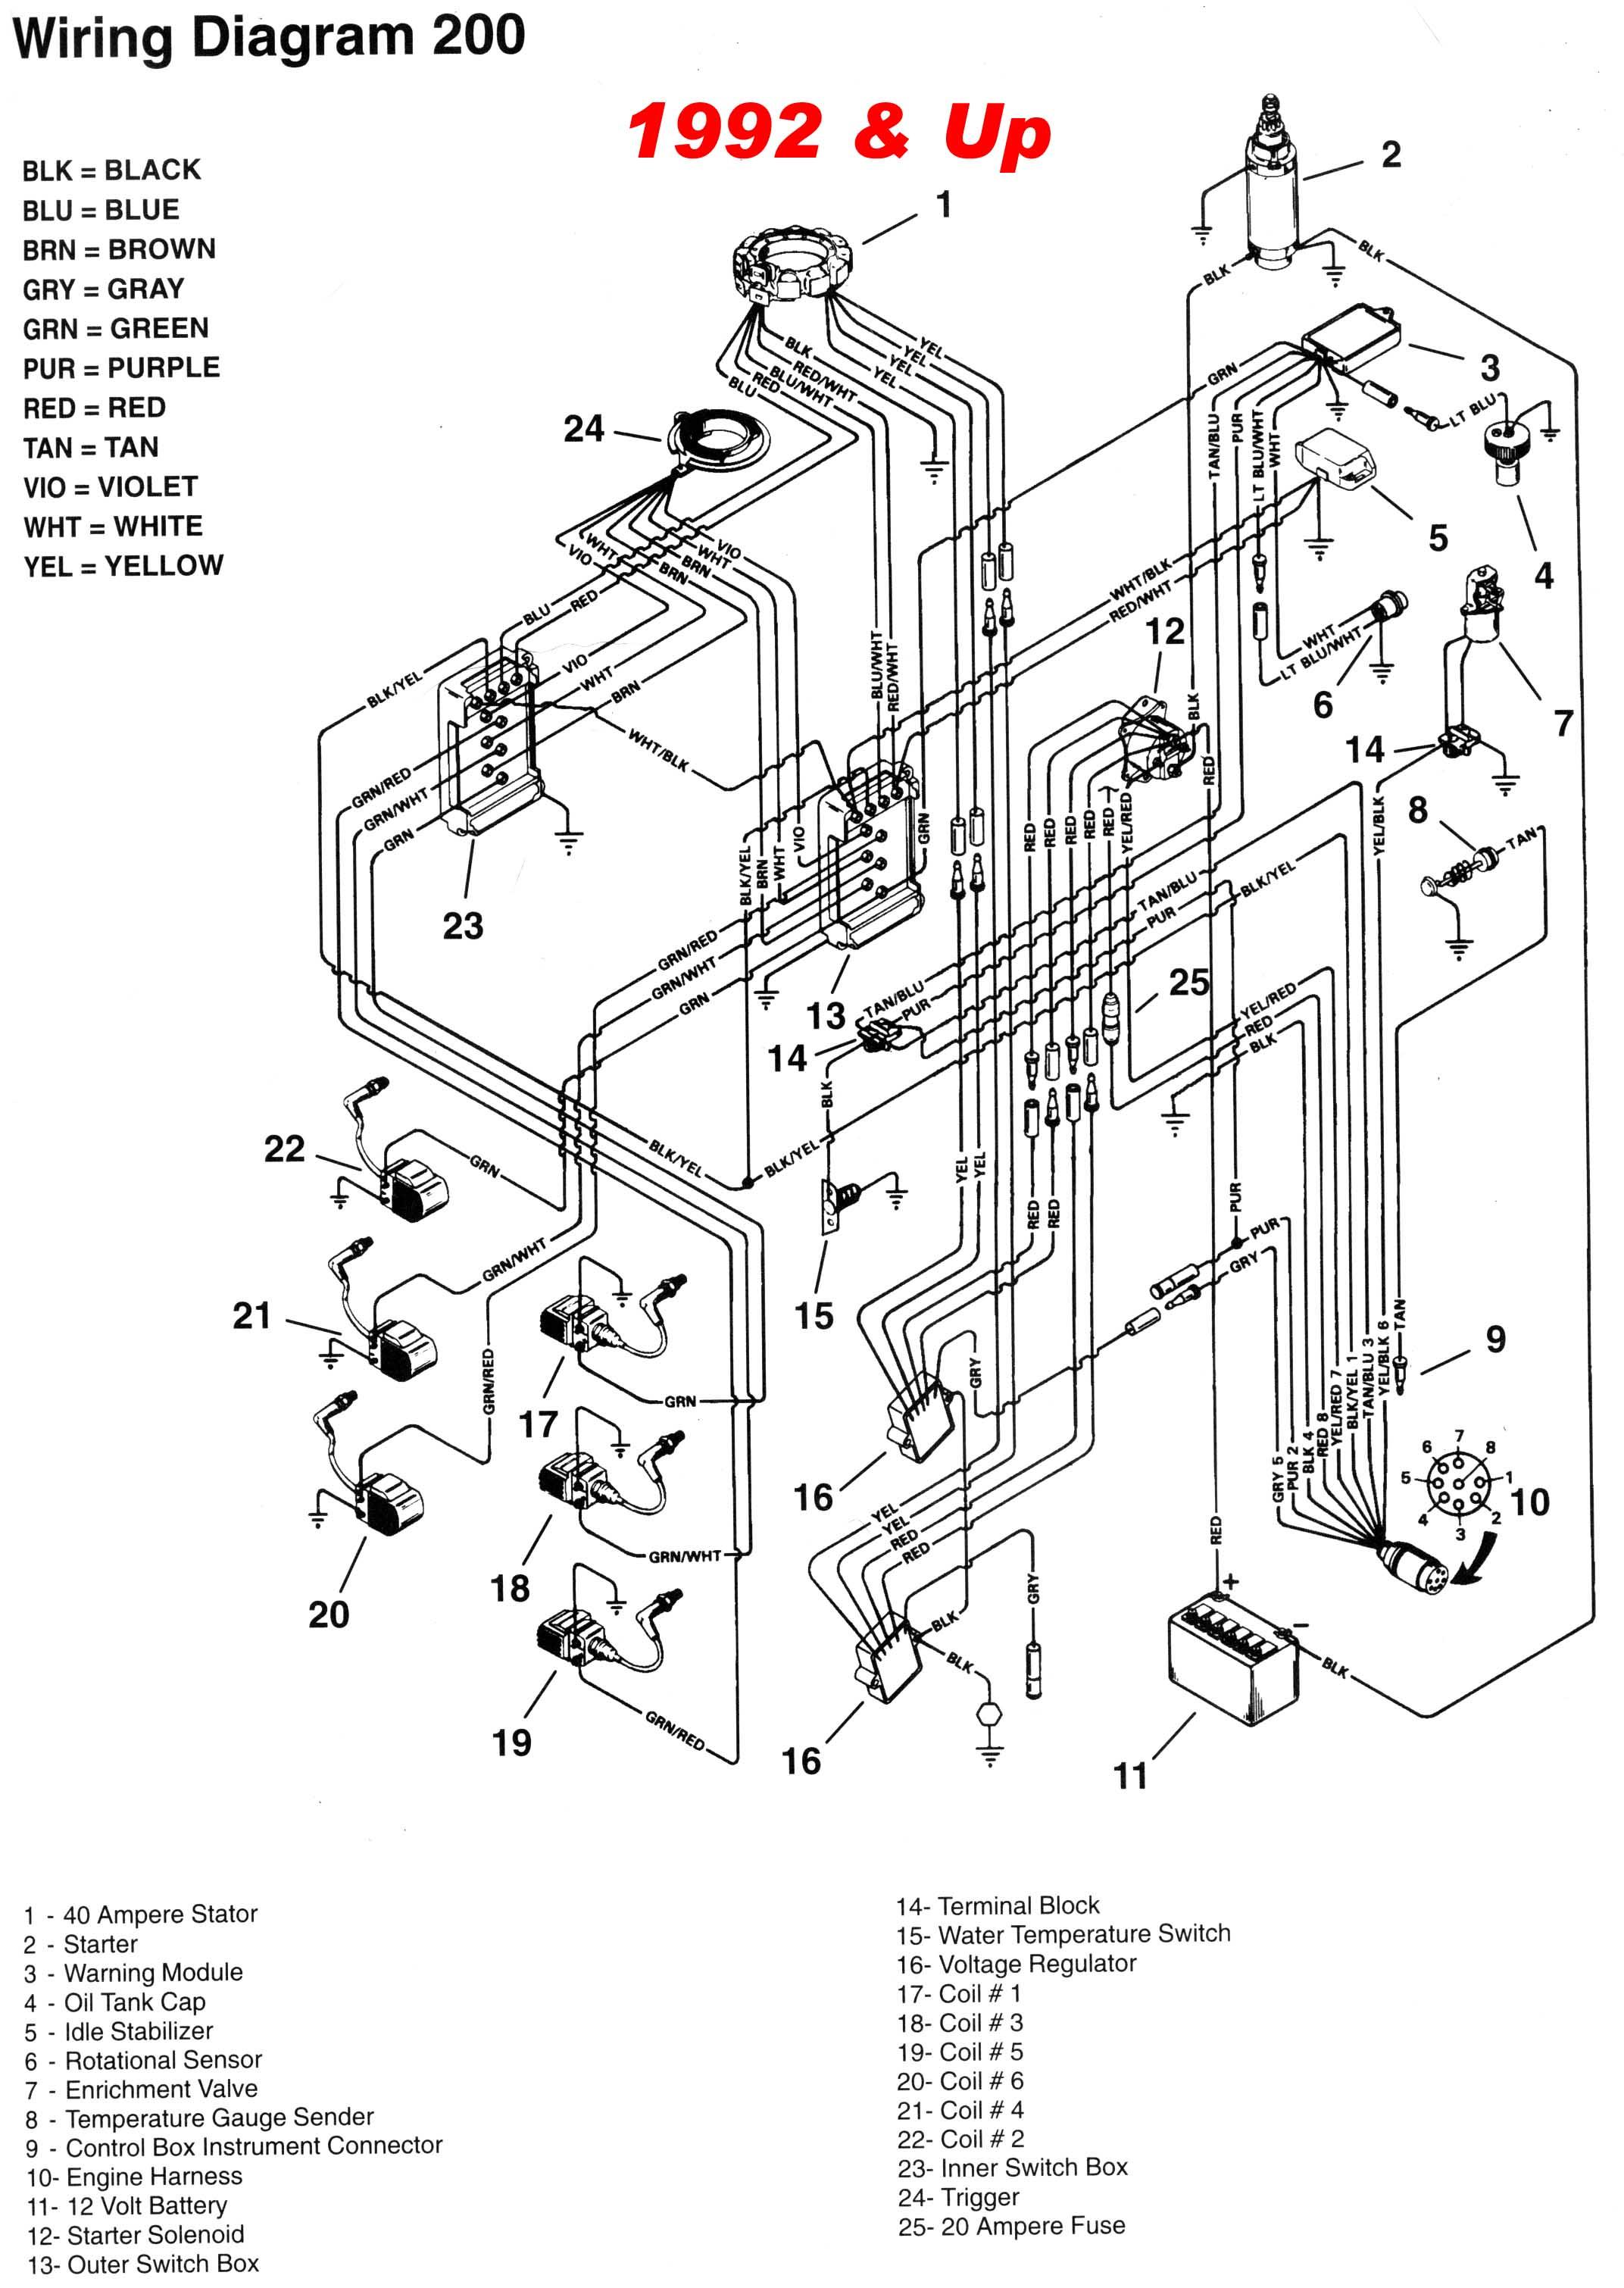 2 Stroke Engine Wire Diagram The Portal And Forum Of Wiring 1949 Ford Gen Todays Rh 13 Wwww 5 1813weddingbarn Com Oil Mix Chart 49cc Two